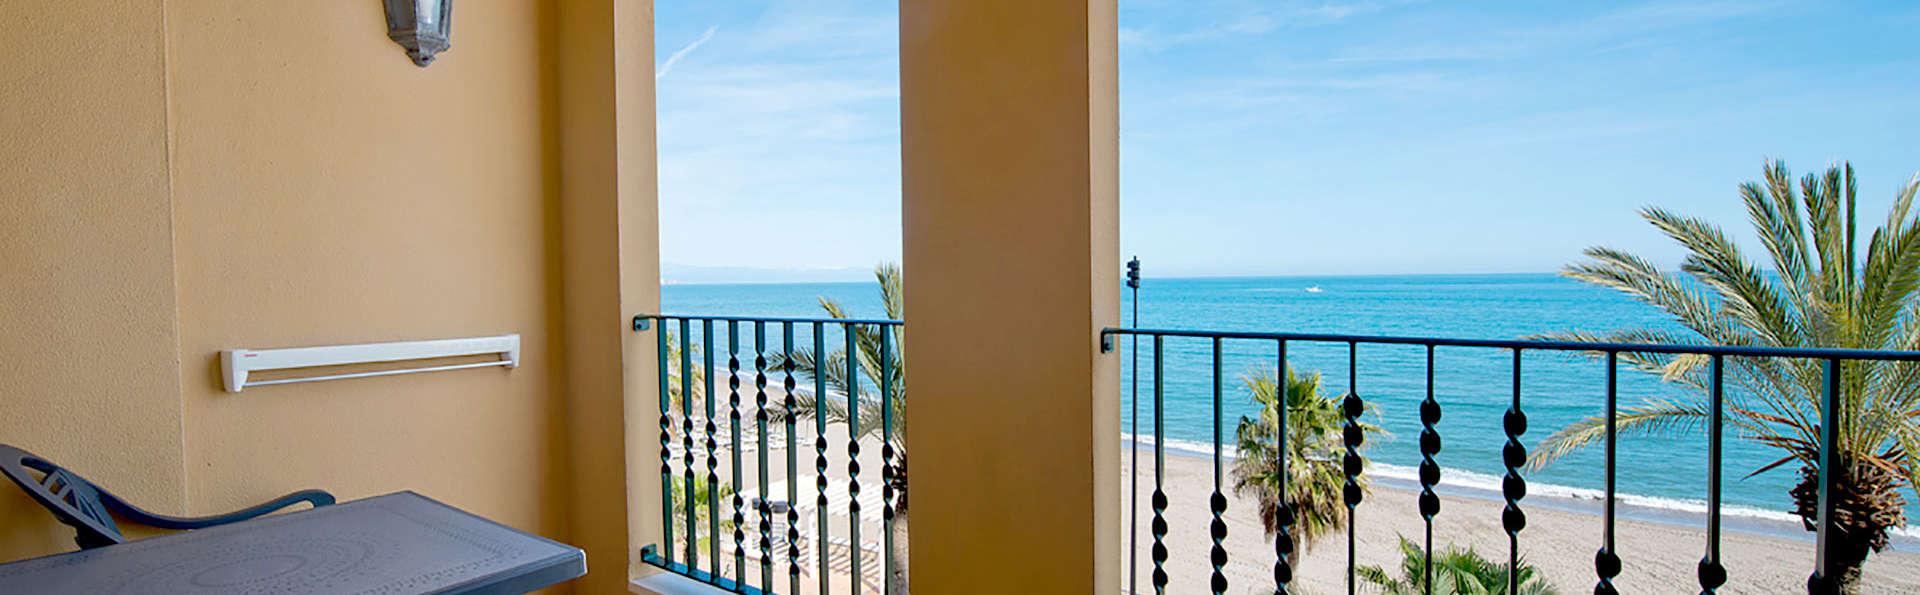 Hotel IPV Palace & Spa - Edit_view.jpg